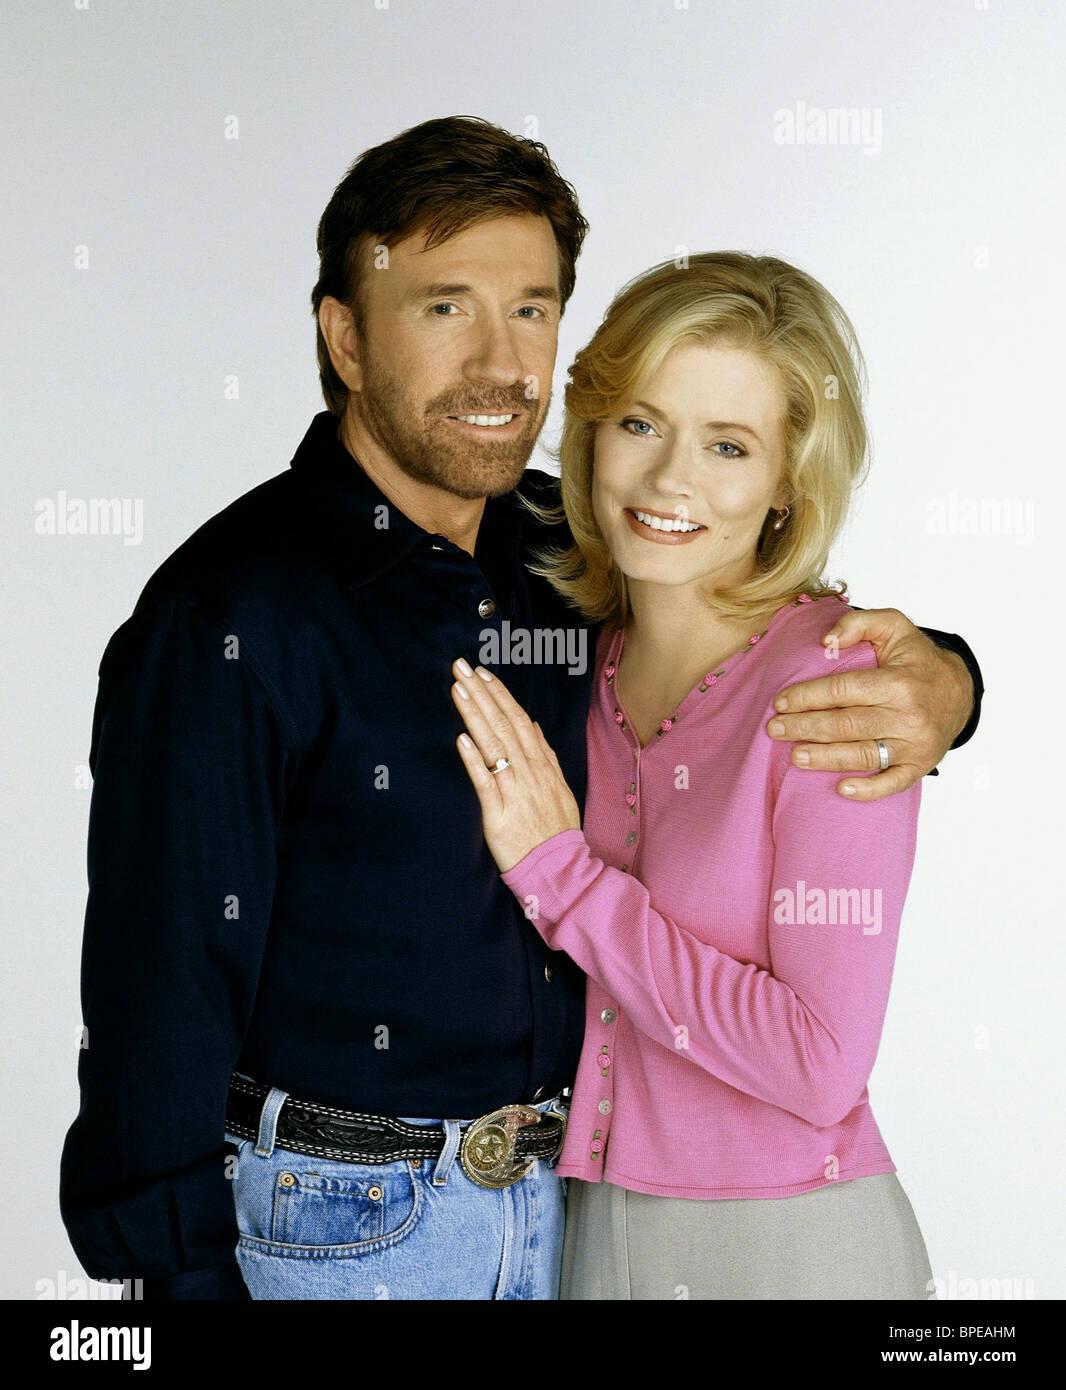 Chuck Norris Films Et Programmes Tv : chuck, norris, films, programmes, CHUCK, NORRIS,, SHEREE, WILSON,, WALKER, TEXAS, RANGER,, Stock, Photo, Alamy